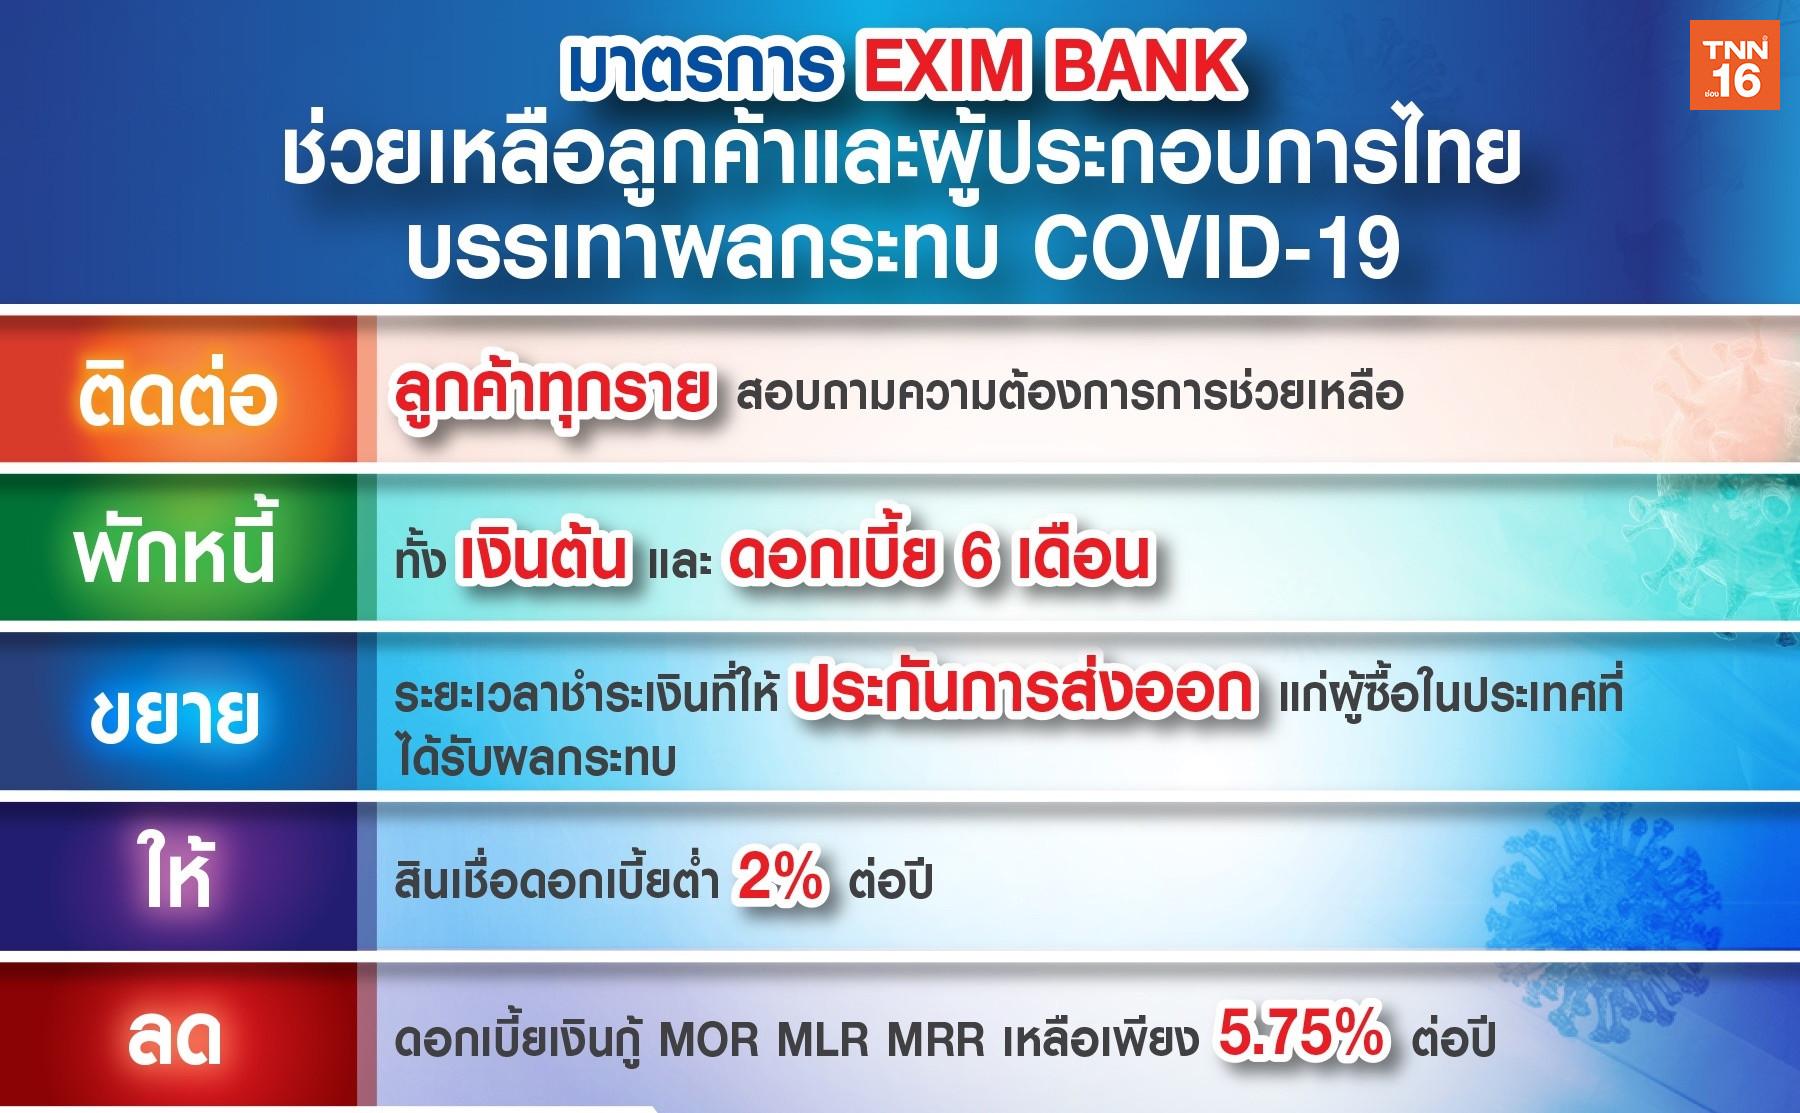 EXIM BANK พักชำระเงินต้น-ดอกเบี้ย 6 เดือน